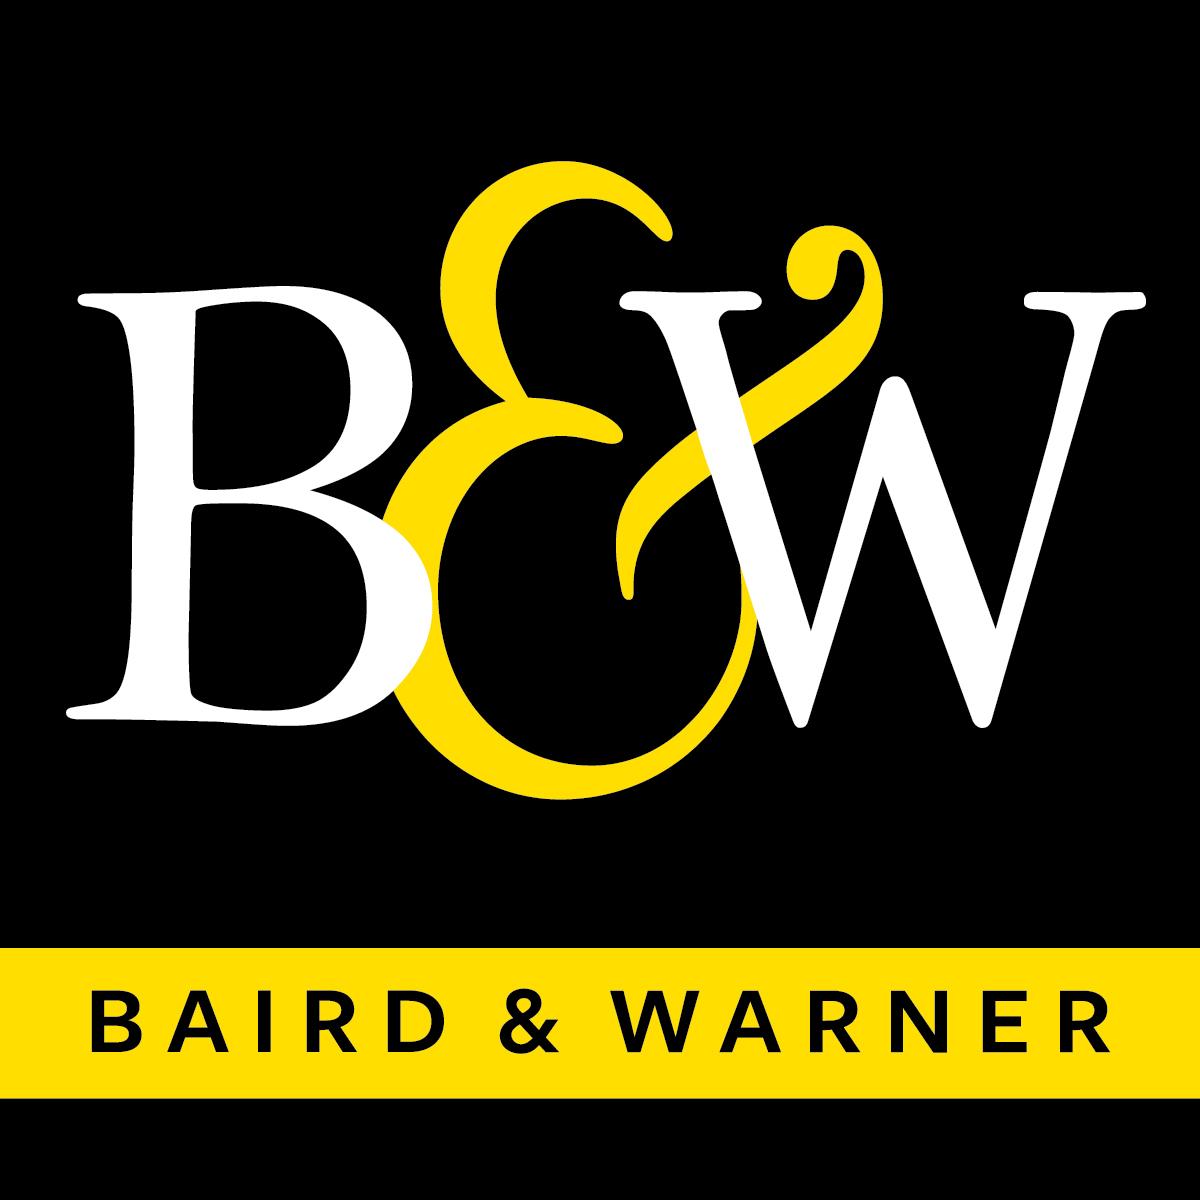 baird-warner-new-logo